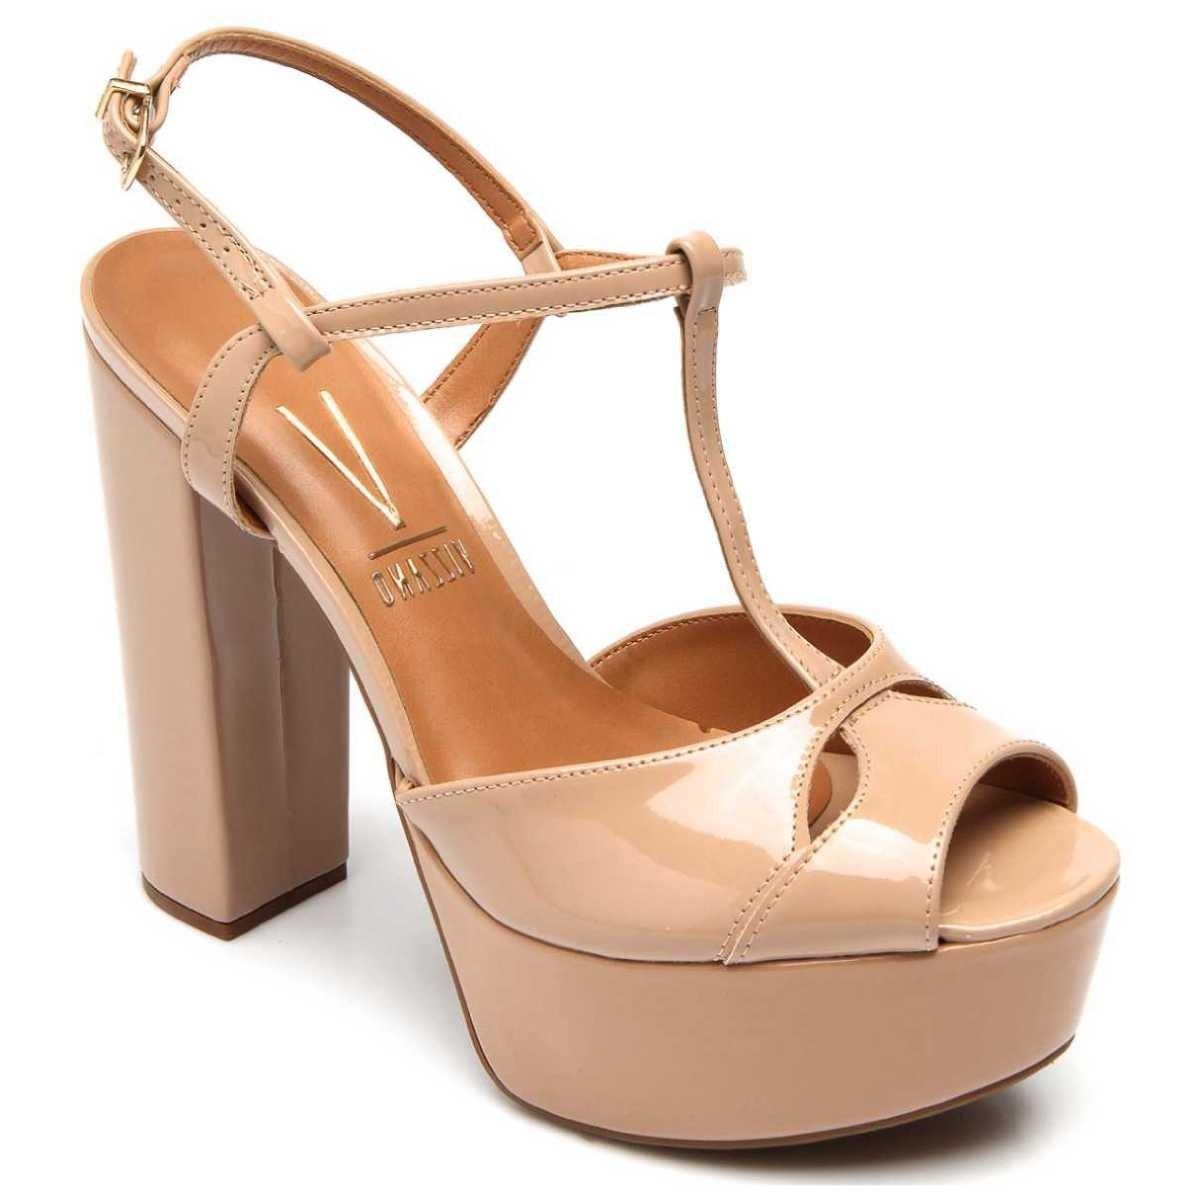 a1ff40274 sandália feminina vizzano meia pata verniz. Carregando zoom.